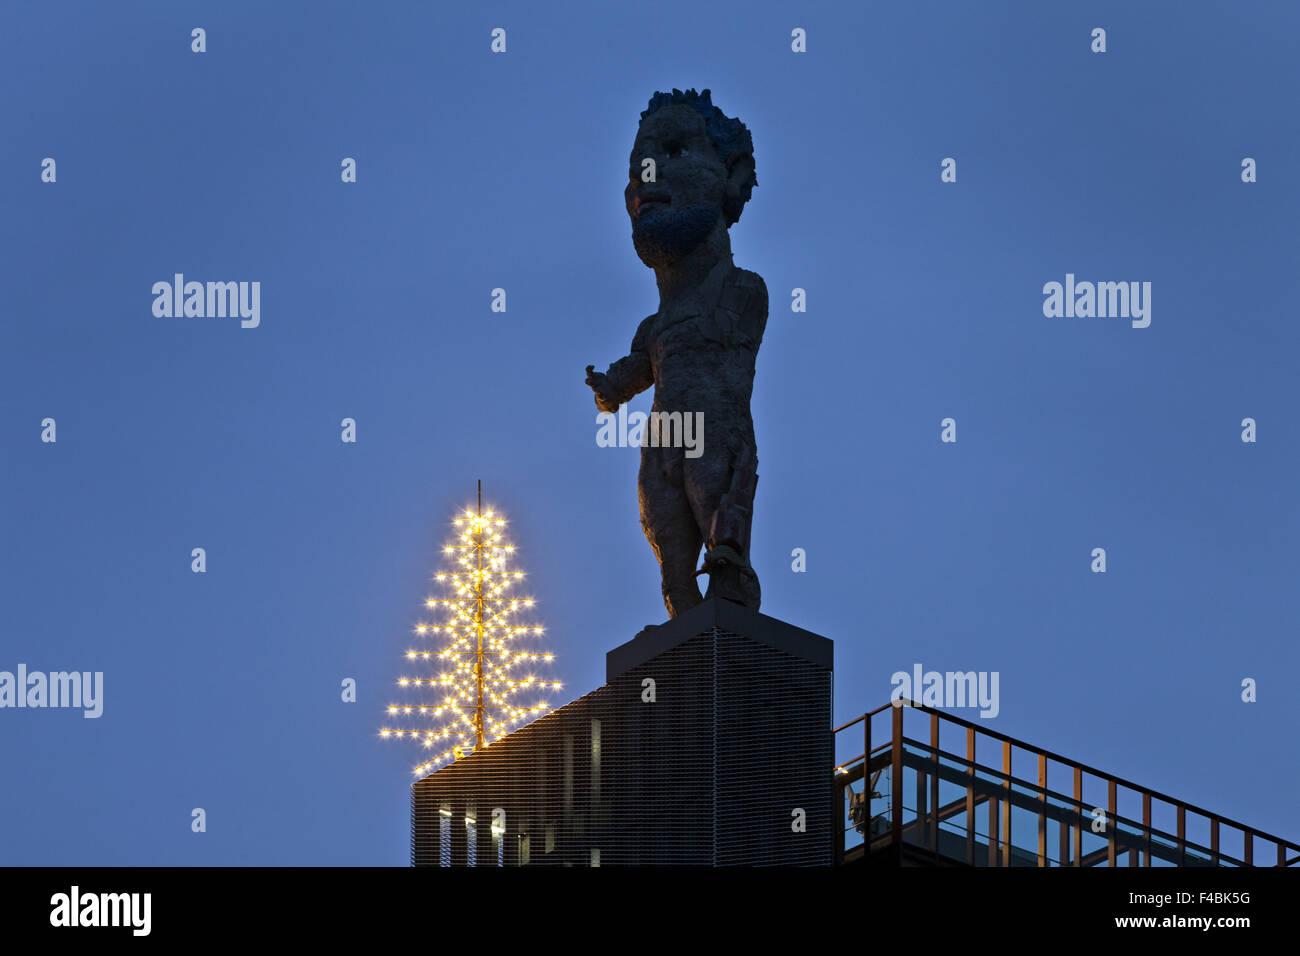 Artwork Hercules, Gelsenkirchen, Germany. - Stock Image